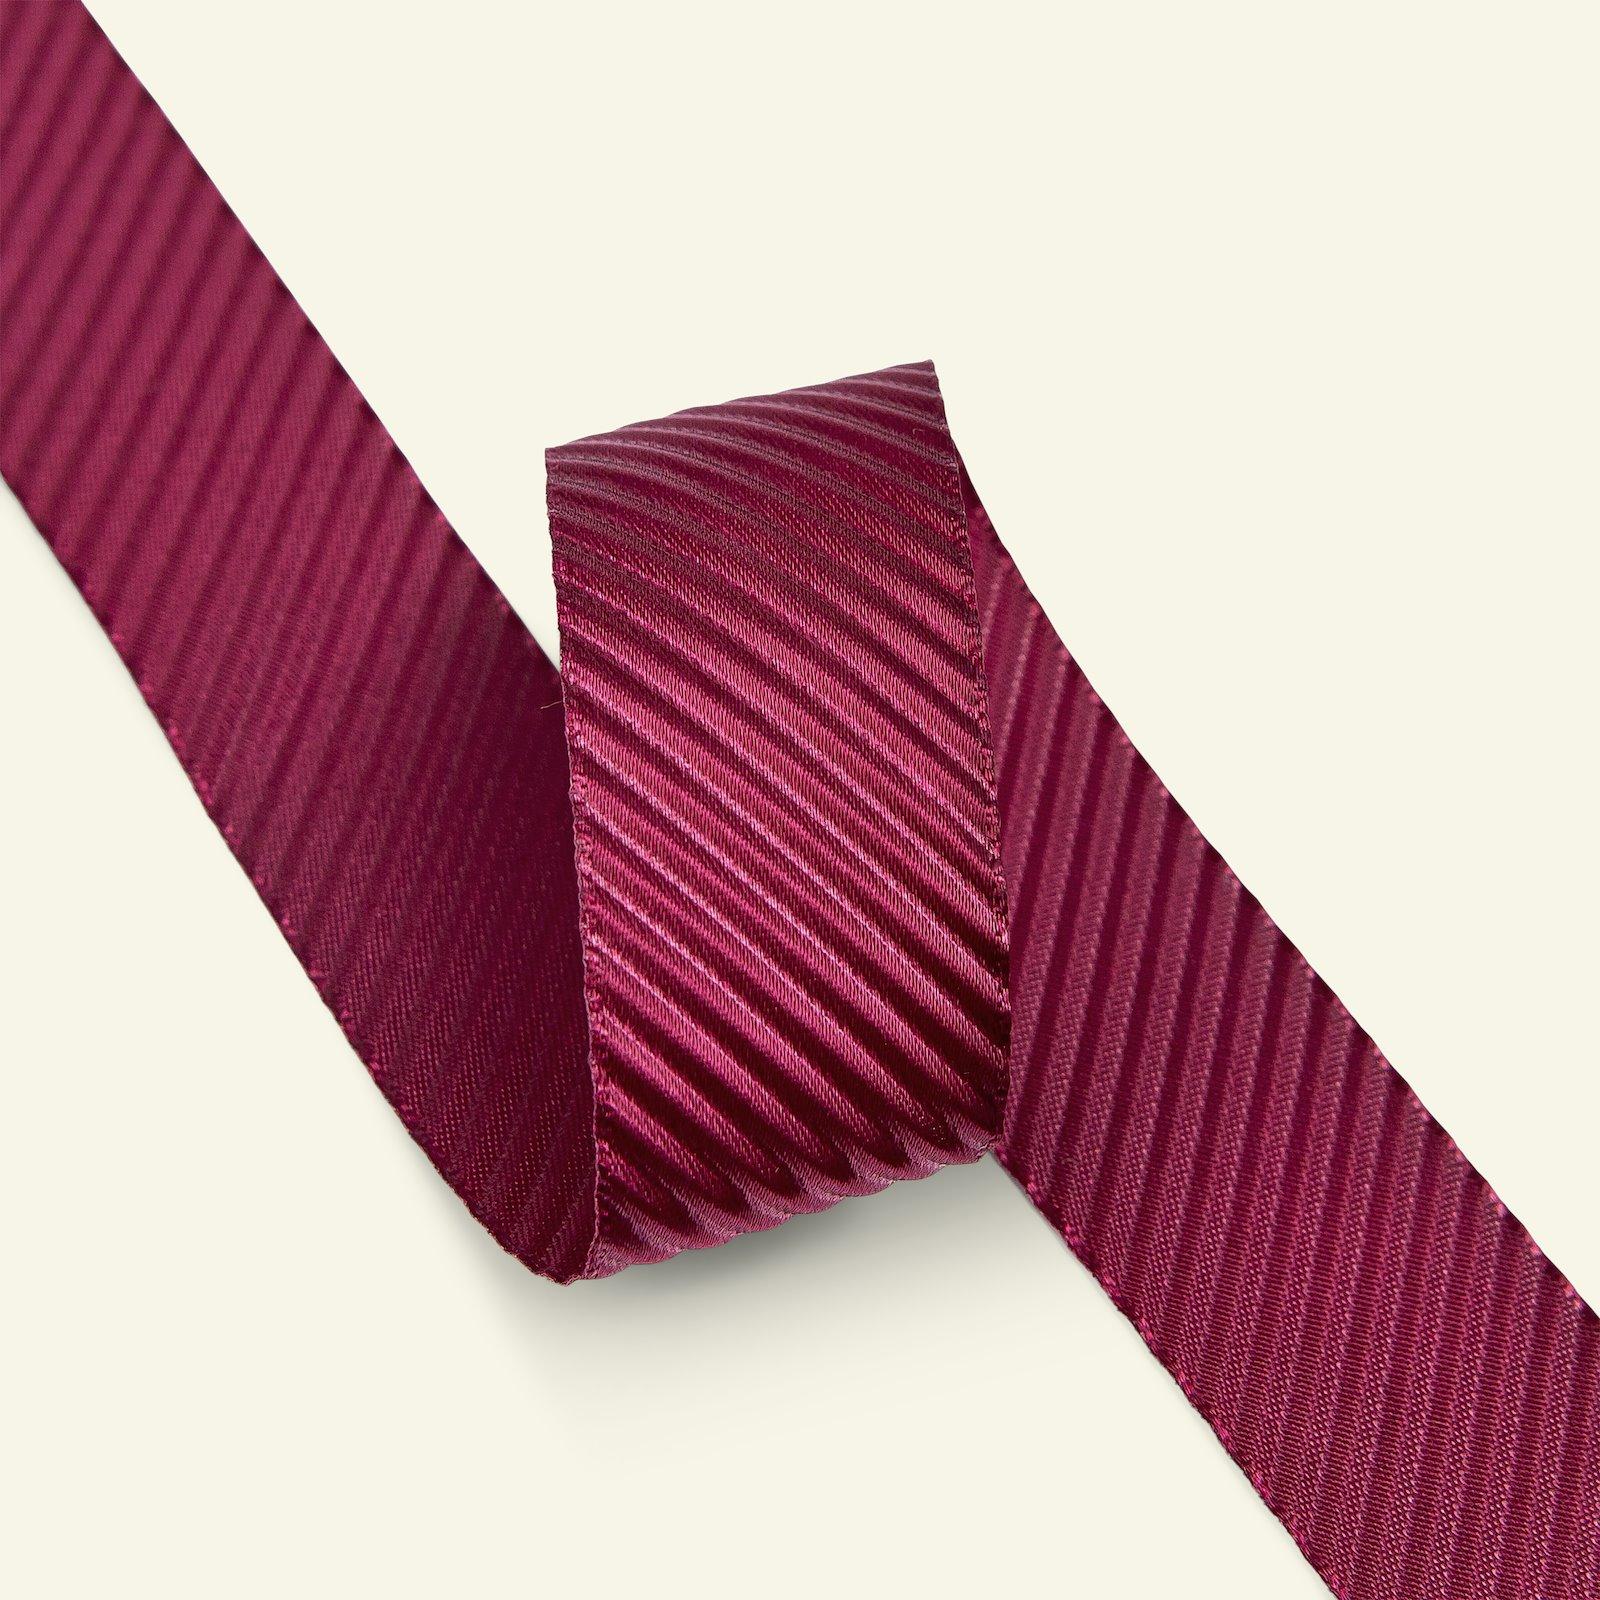 Ribbon fluted 27mm bordeaux 3m 21390_pack